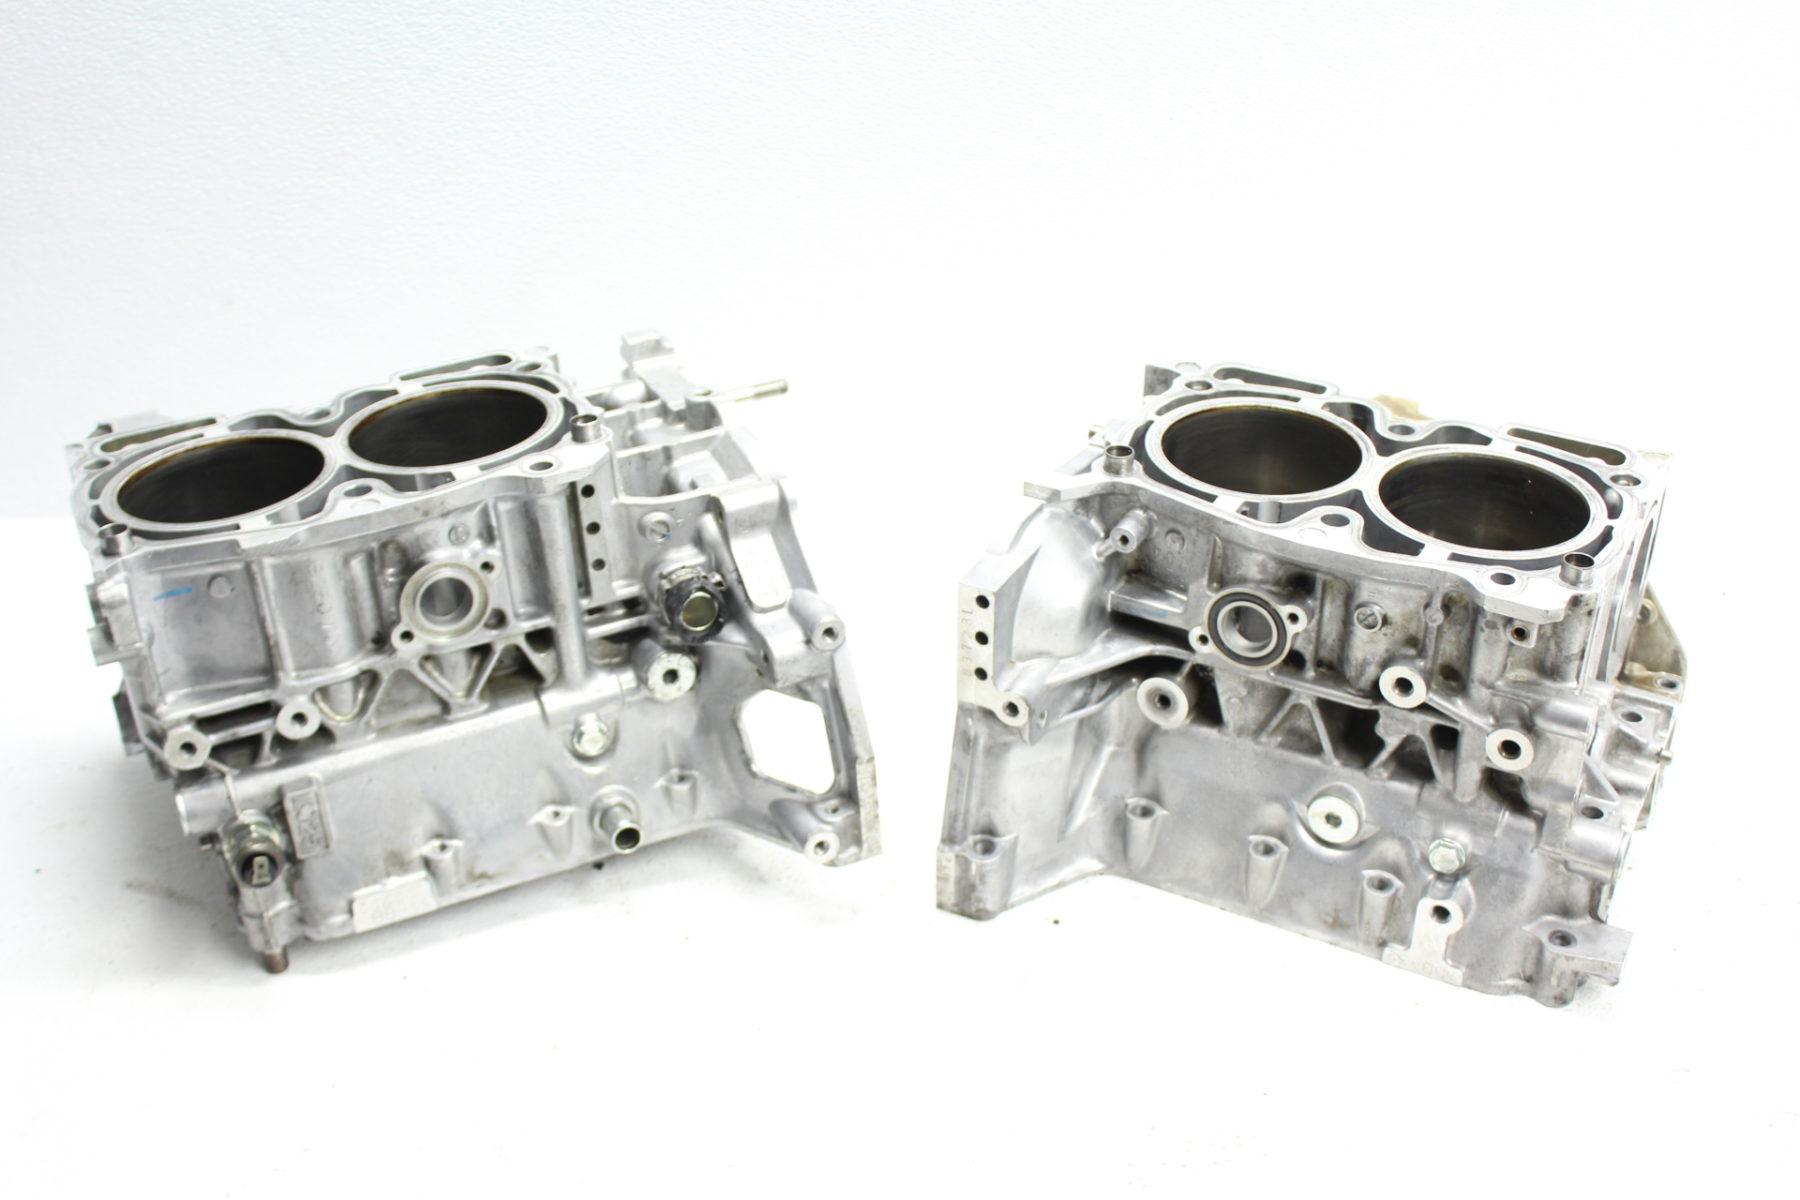 08-14 2008-2014 SUBARU IMPREZA WRX & STI BARE ENGINE SHORT BLOCK OEM EJ255  EJ257